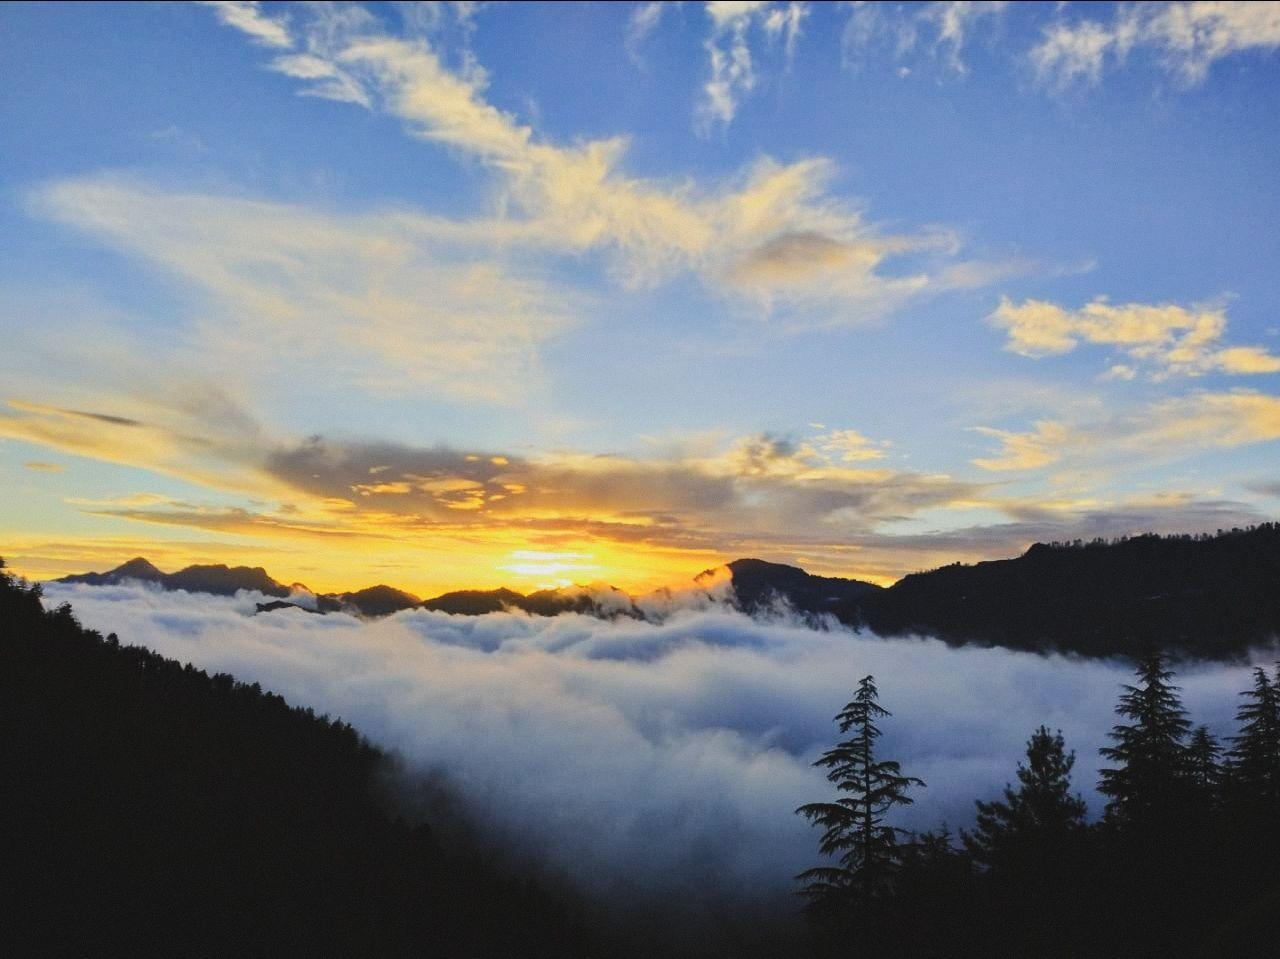 Photo of Himalayas By Shubhee